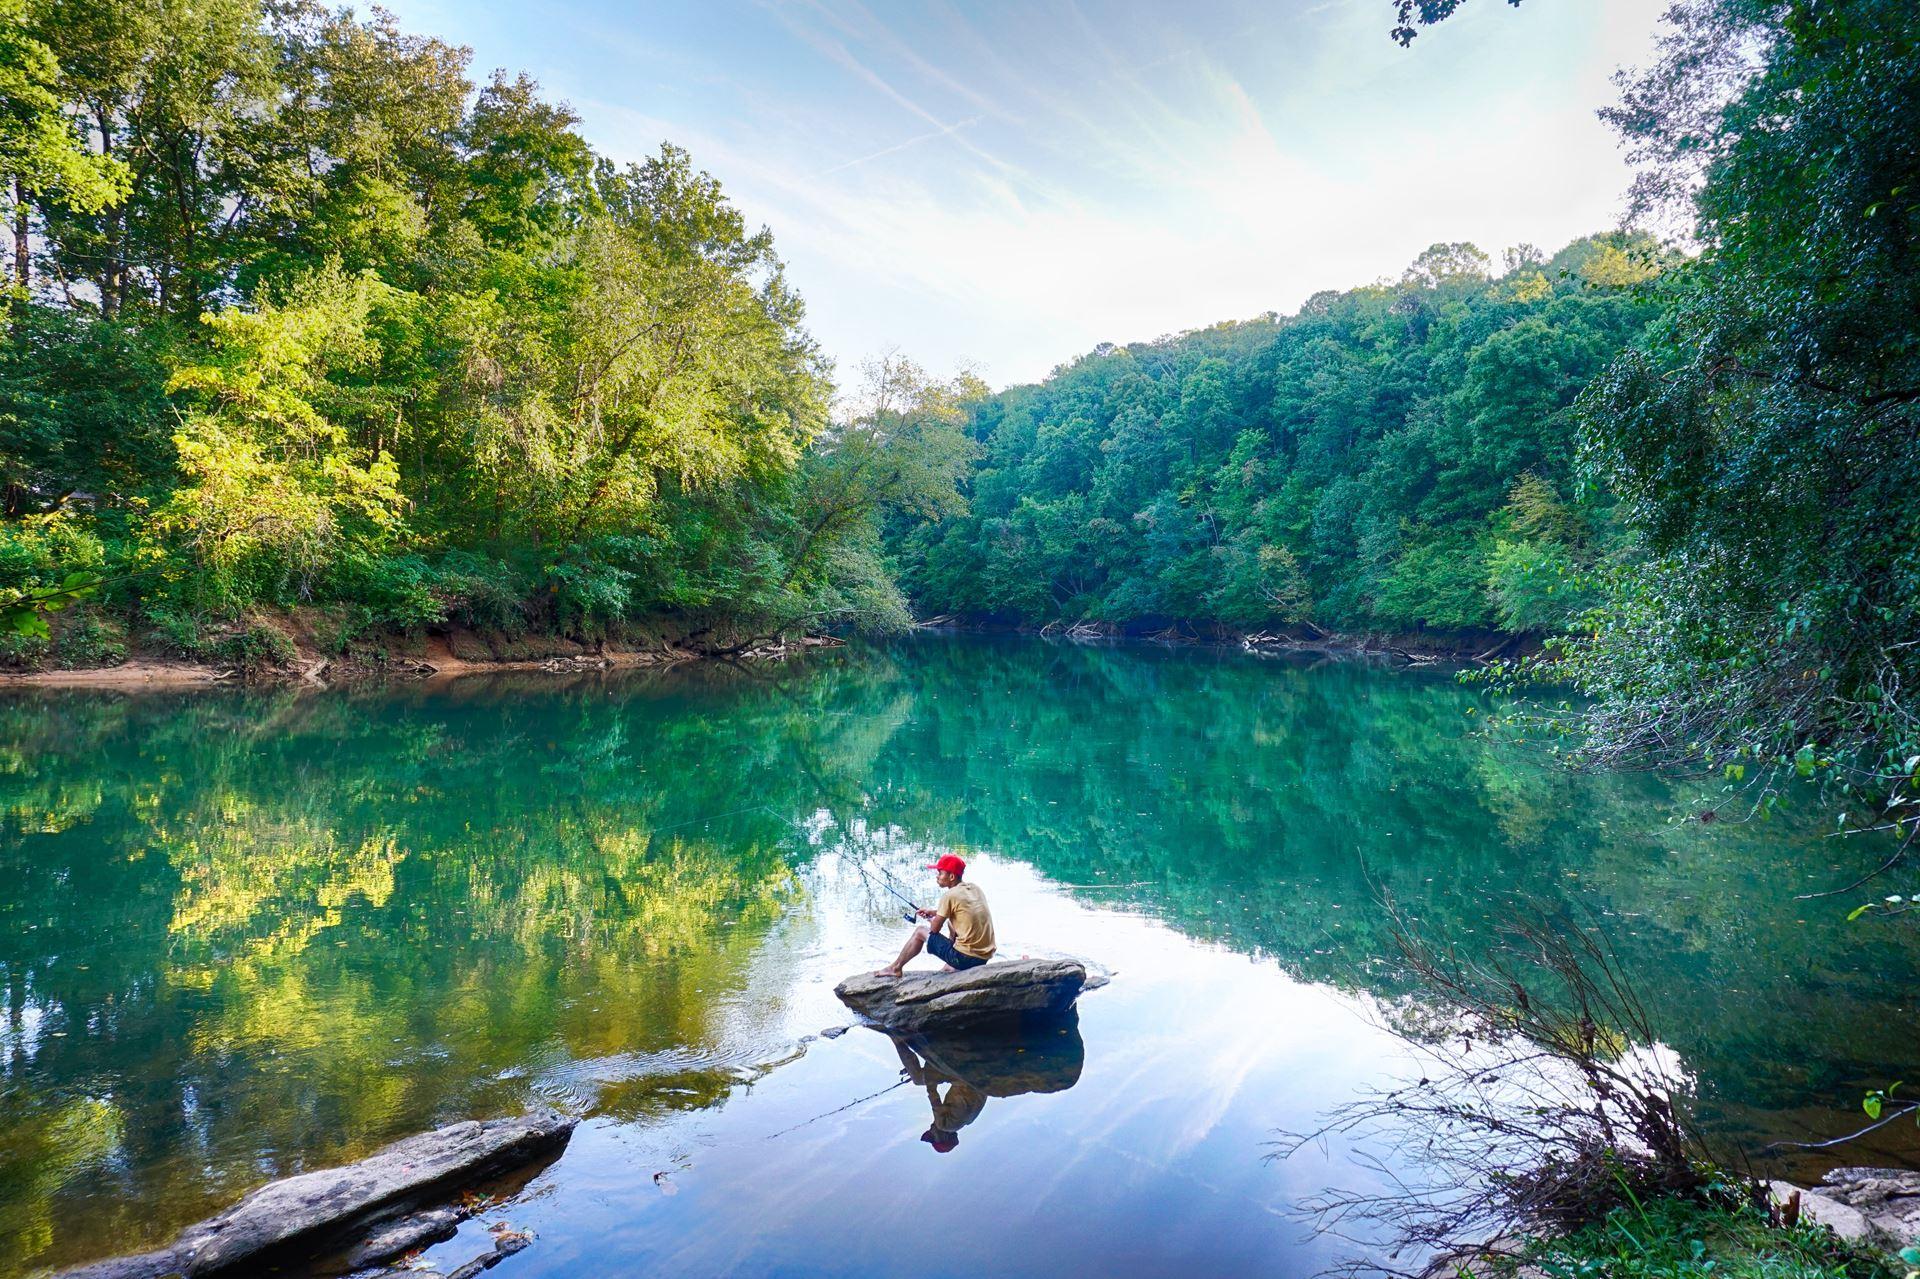 fishing on the chattahoochee river ga photo by steve harwood